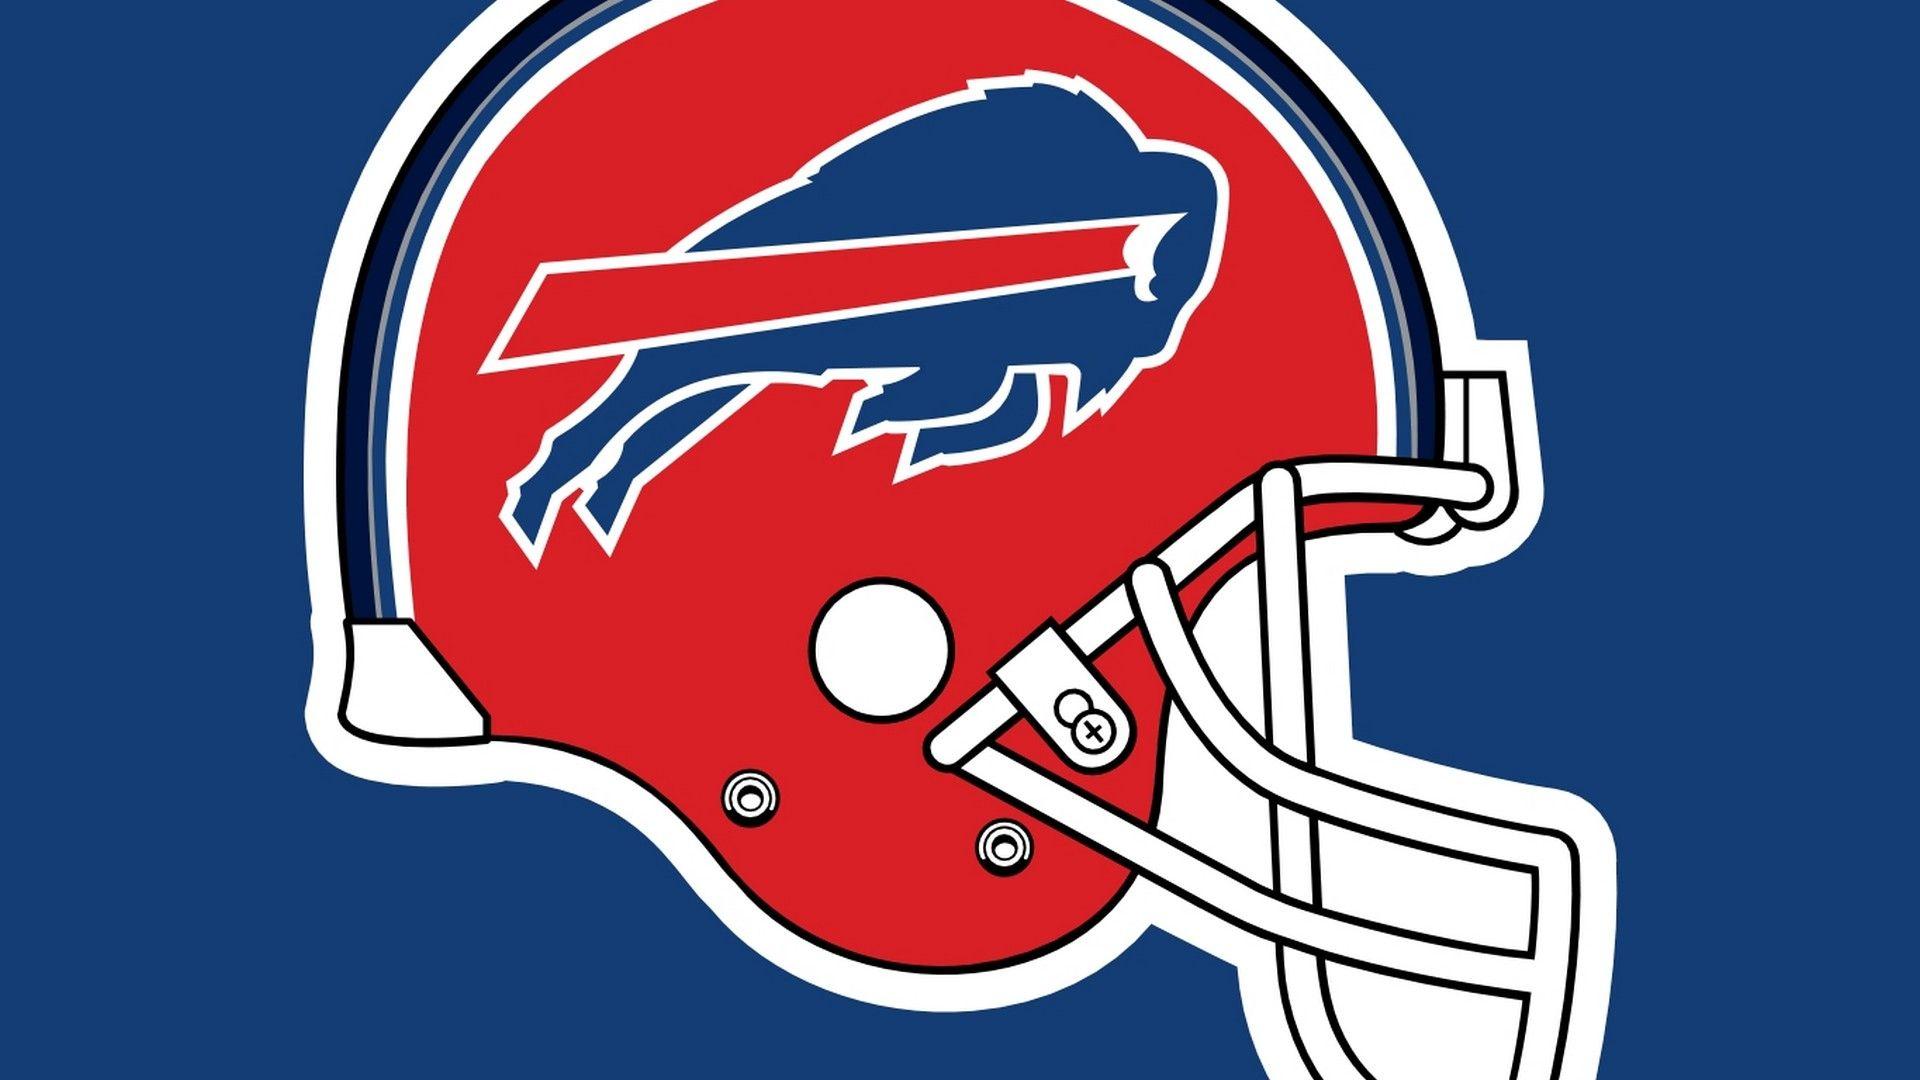 HD Desktop Wallpaper Buffalo Bills NFL Nfl buffalo bills